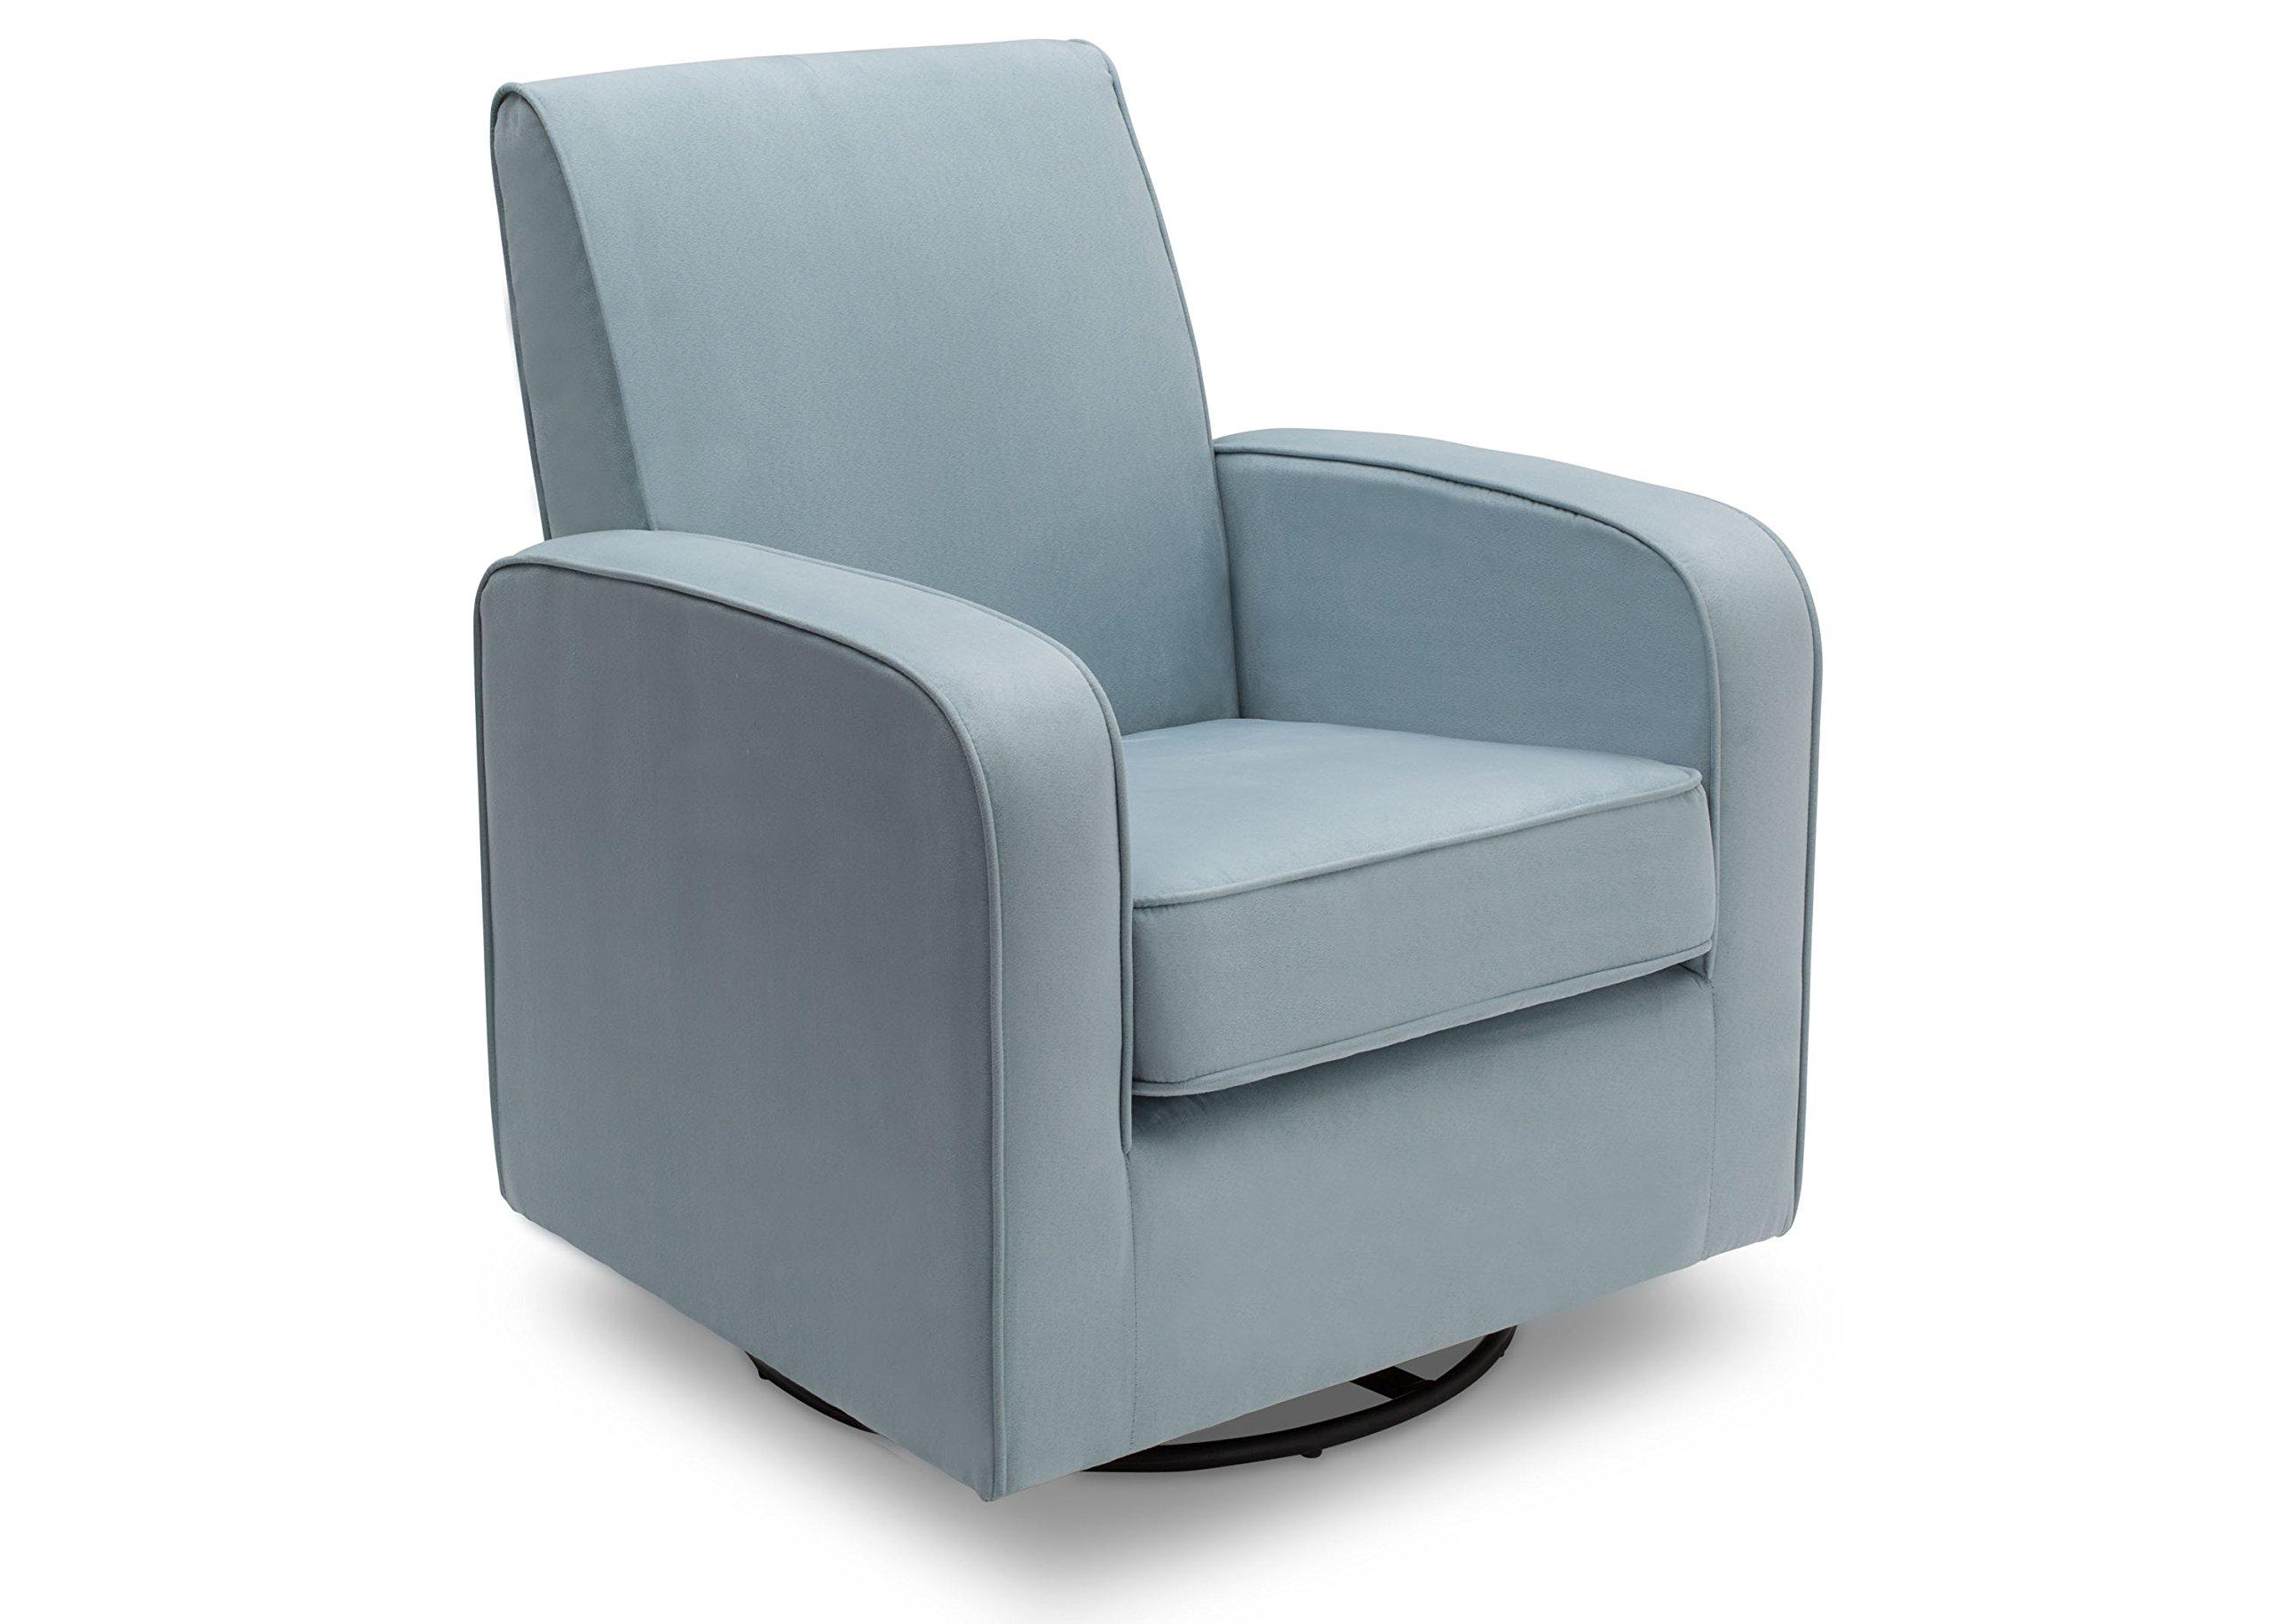 Delta Furniture Chloe Upholstered Glider Swivel Rocker Chair, Frozen Blue